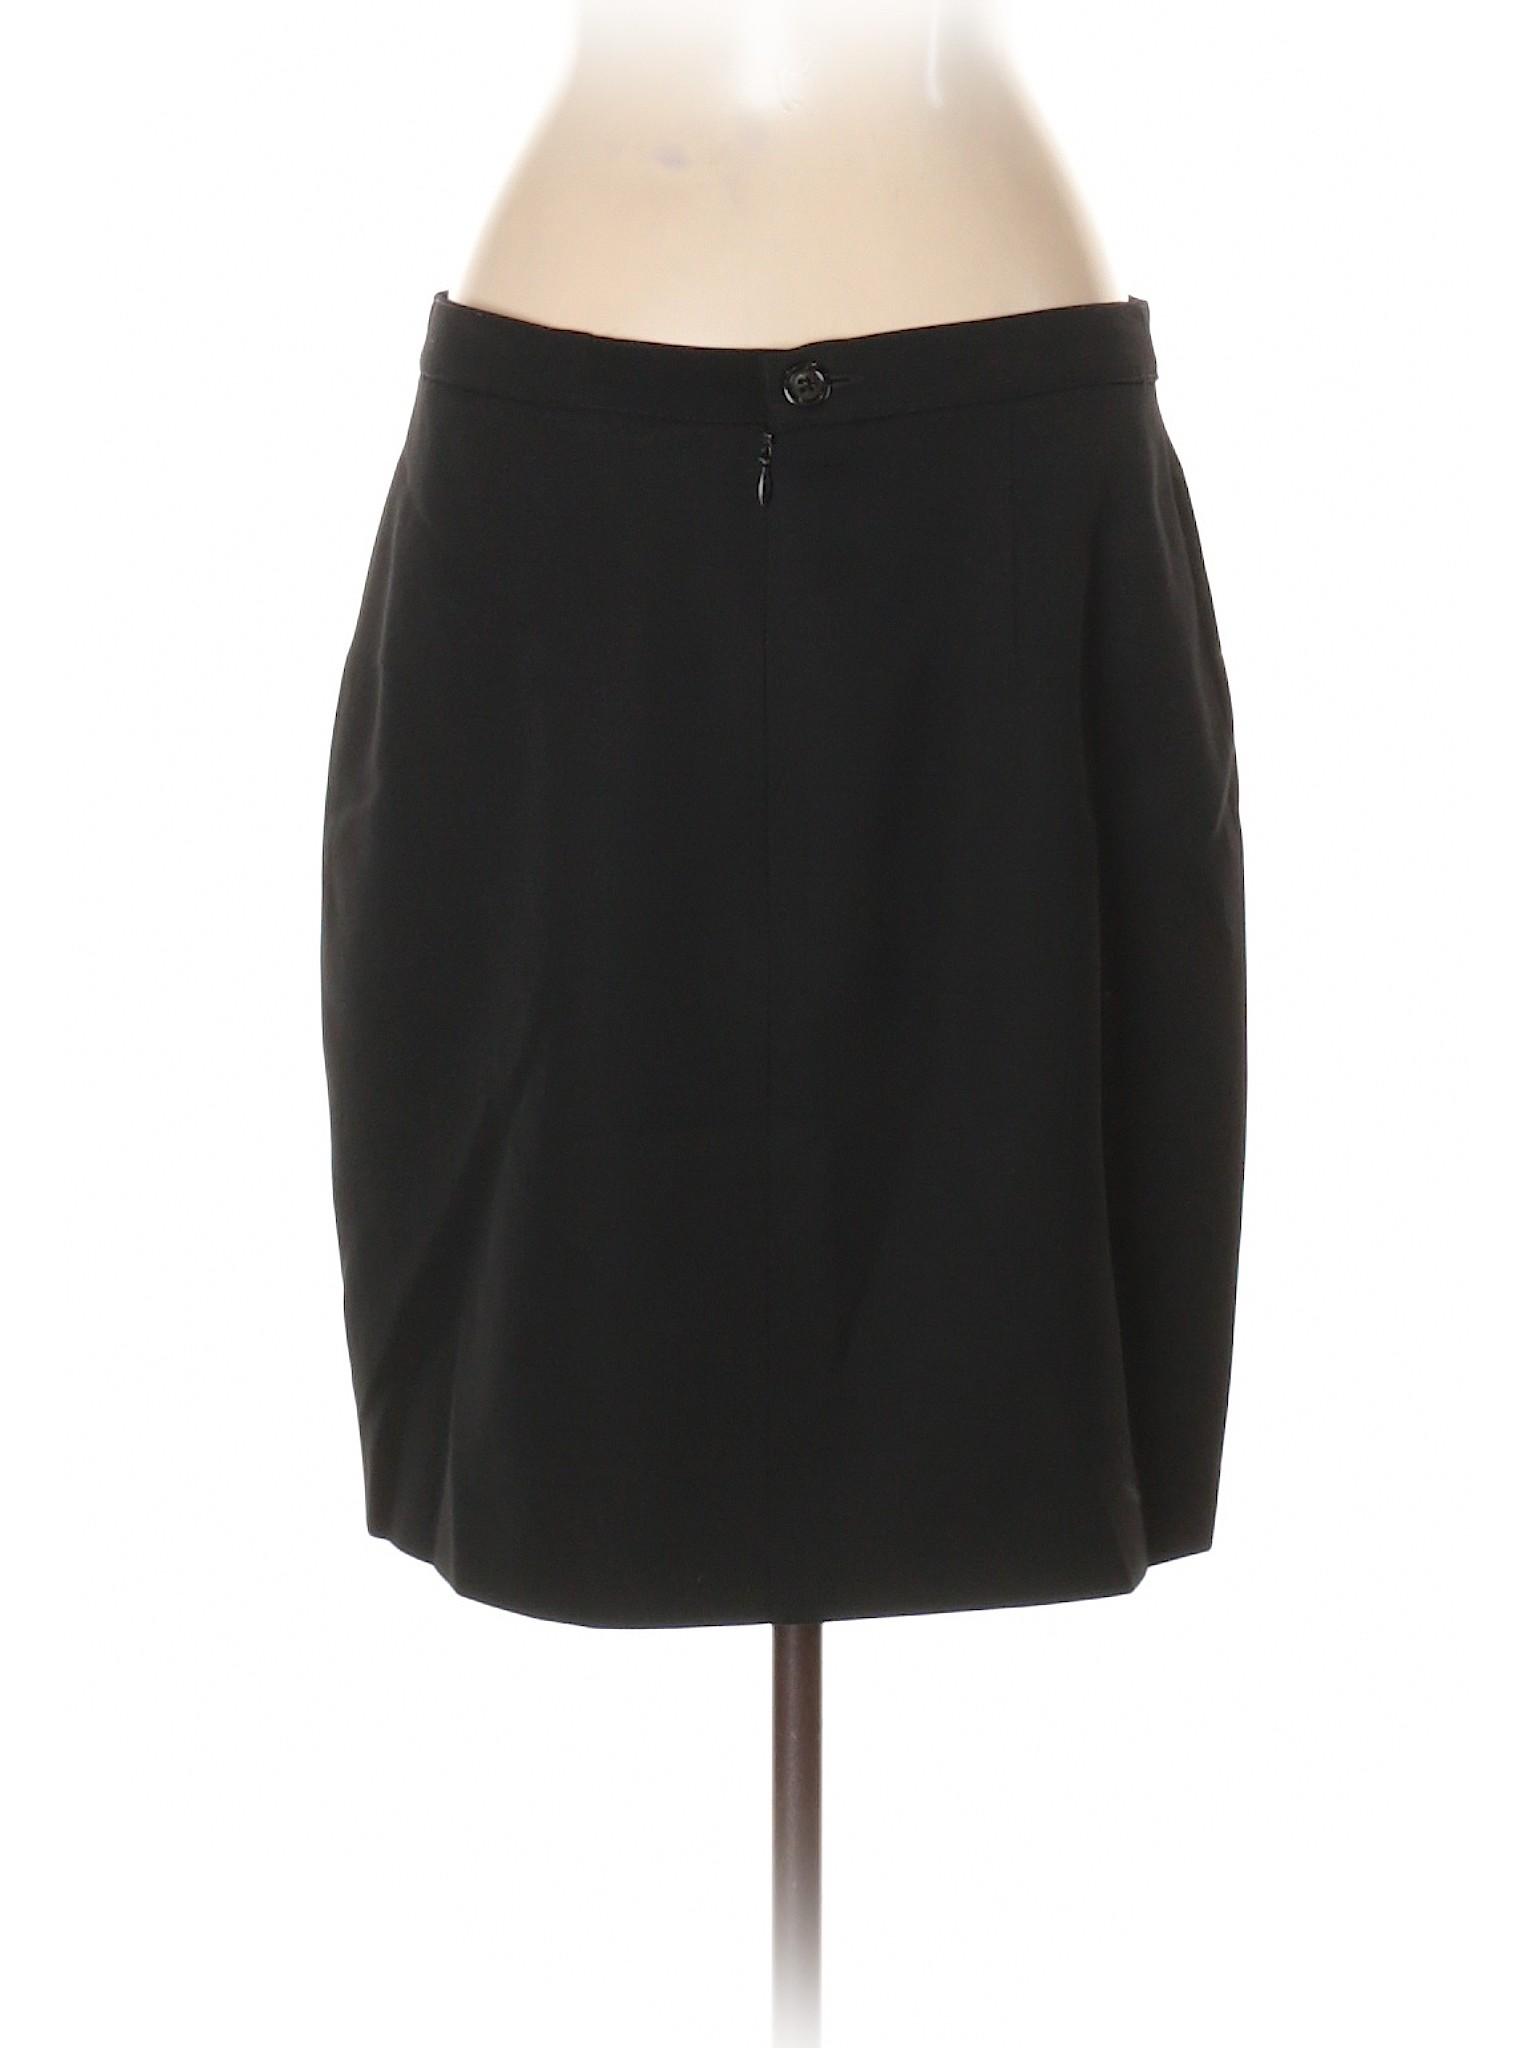 Lagerfeld Skirt Karl Boutique Casual Karl Boutique aqwtxTqg